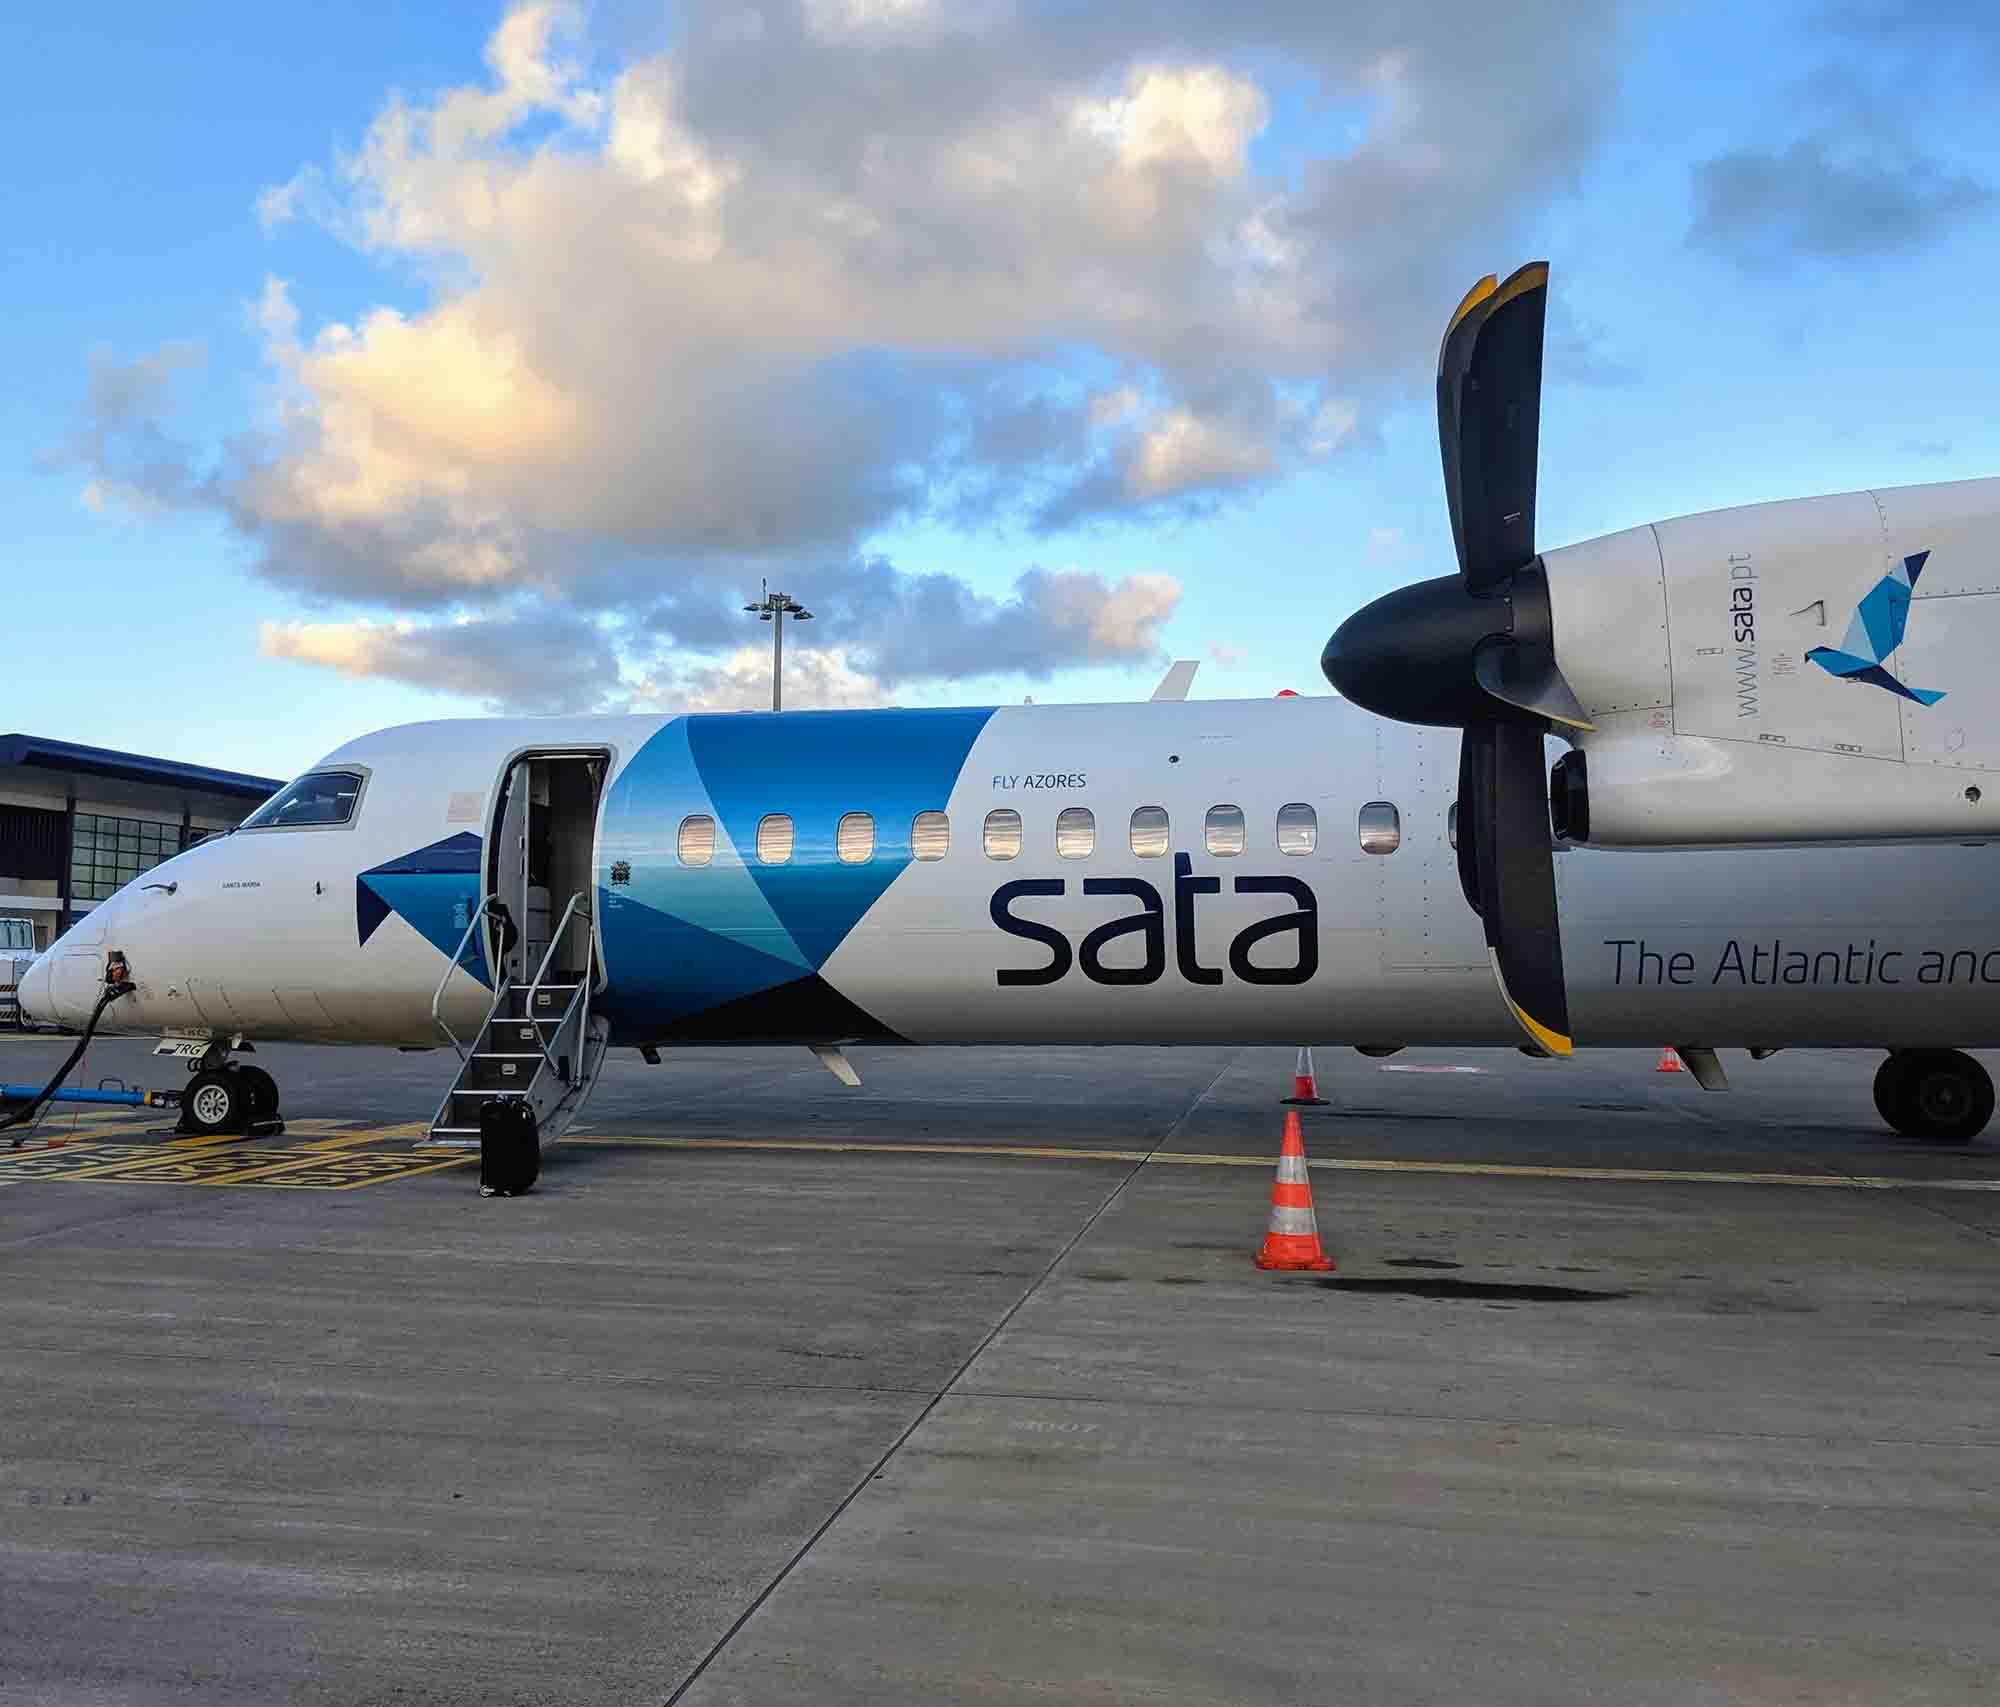 SATA Azores Airlines Plane